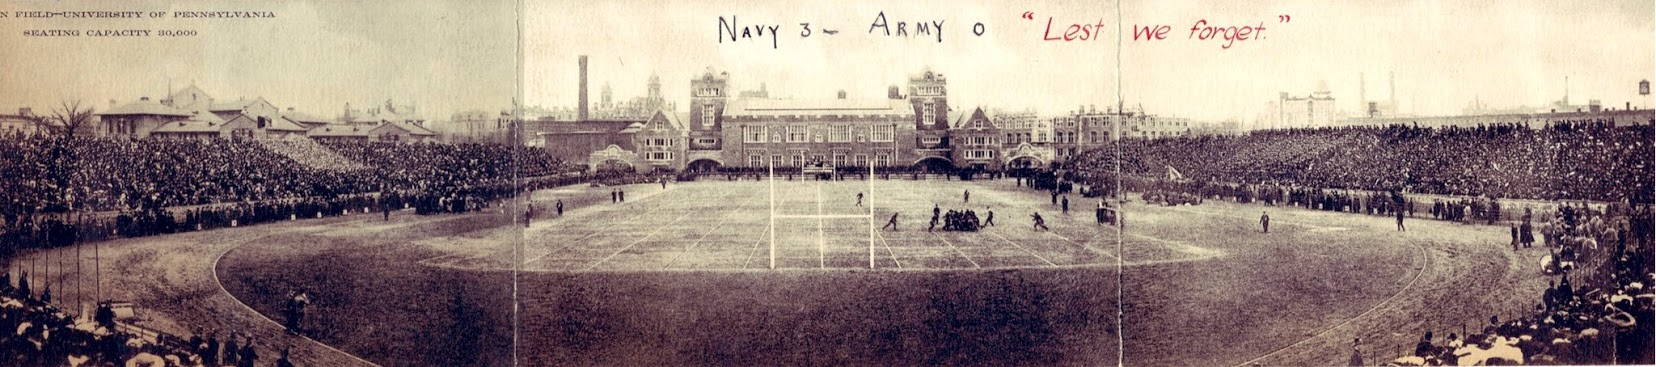 ArmyFB_1911_vsNavy_LestWeForget